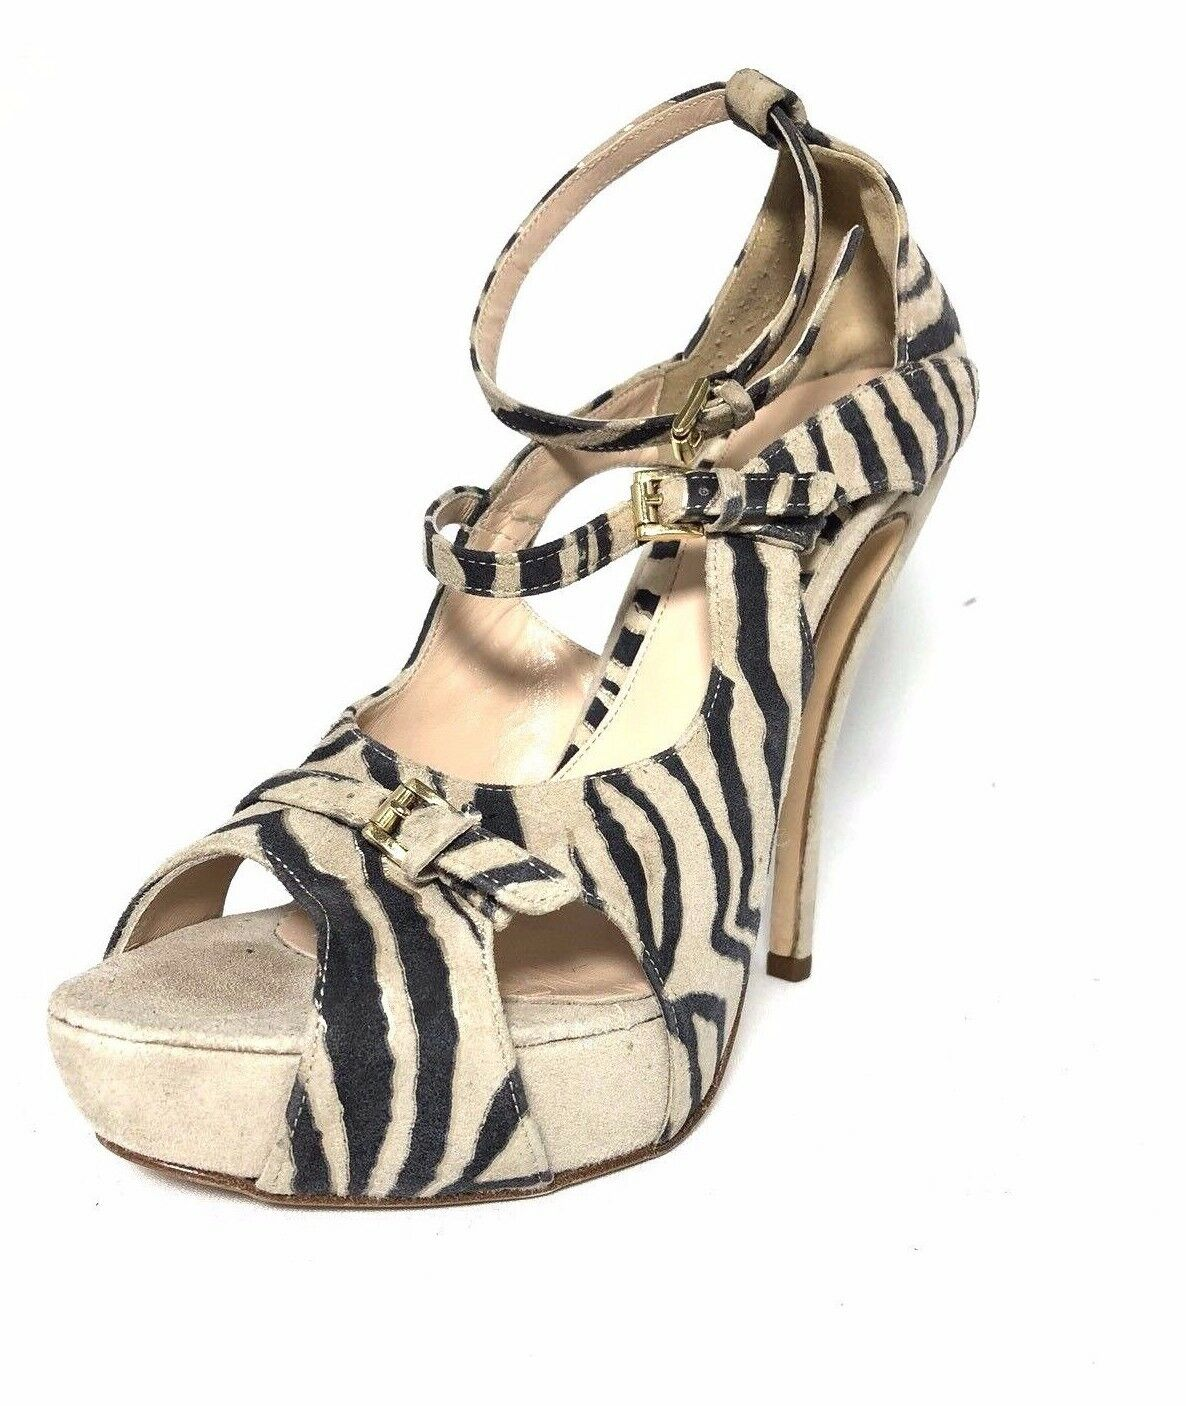 produttori fornitura diretta    345 Charles David Pump Platform Ankle Strap Open Toe Beige Zebra Heels US 9  classico senza tempo